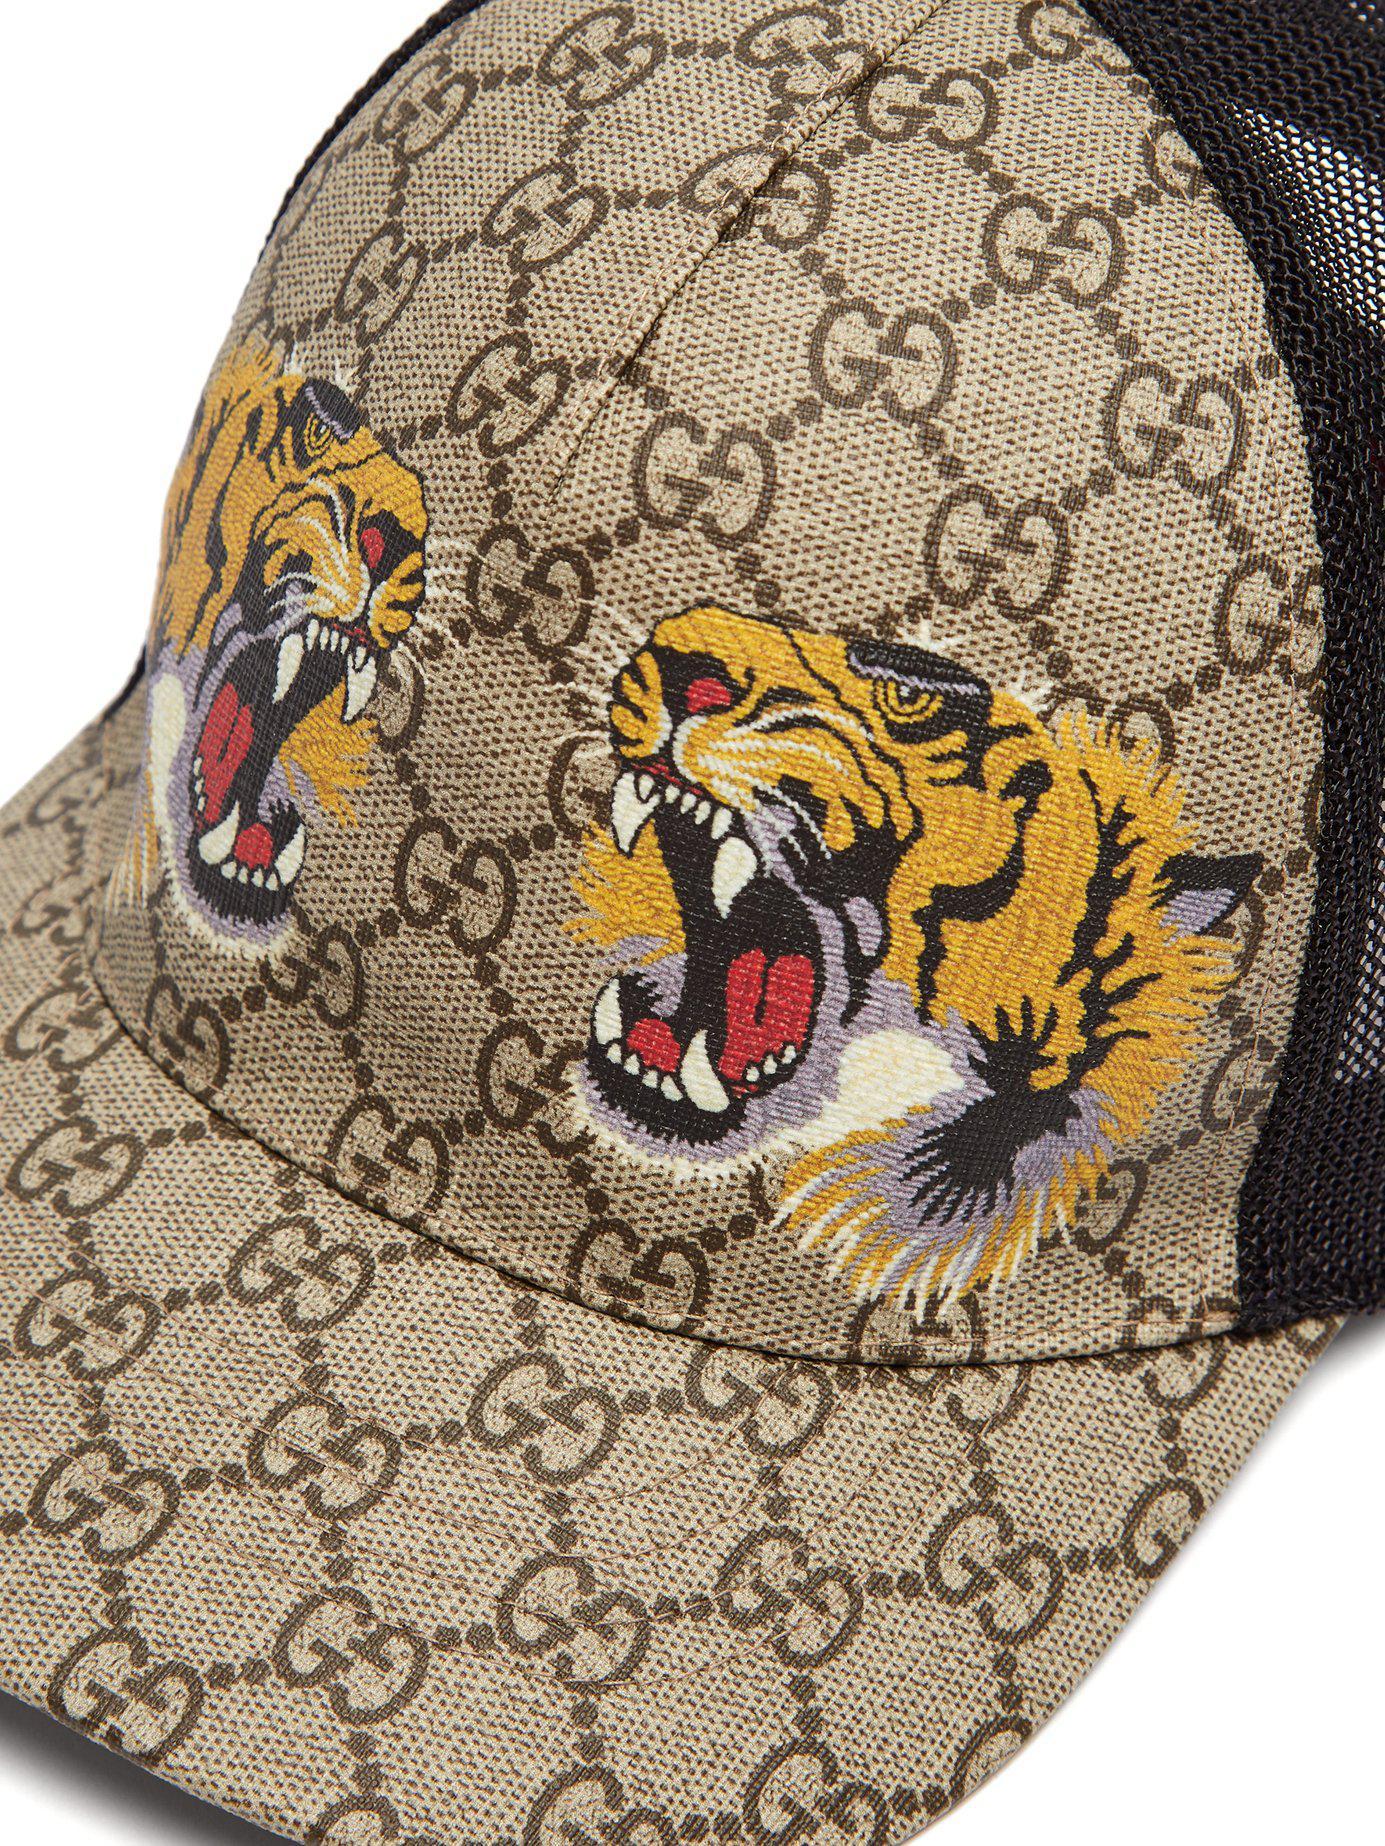 da7b9d58e16 Lyst - Gucci Gg Supreme And Tiger Print Mesh Cap in Natural for Men